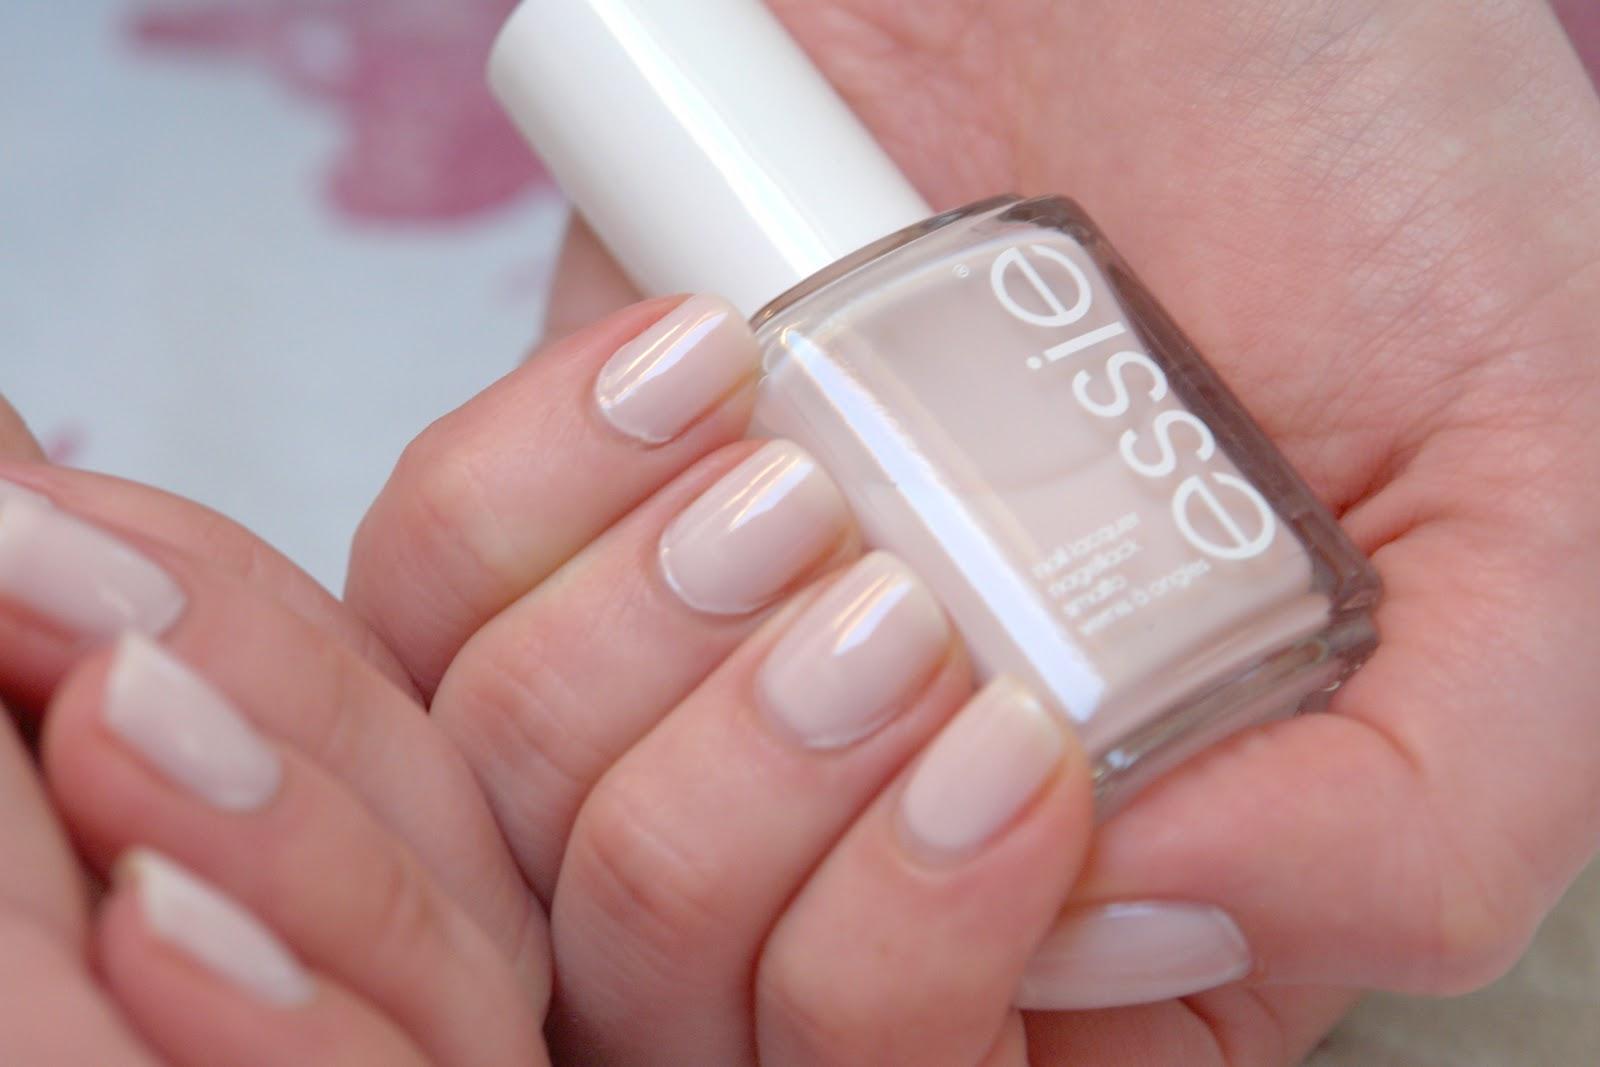 NAILS: Essie ballet slippers, swatches, Essie, nail polish, nails, NOTD,